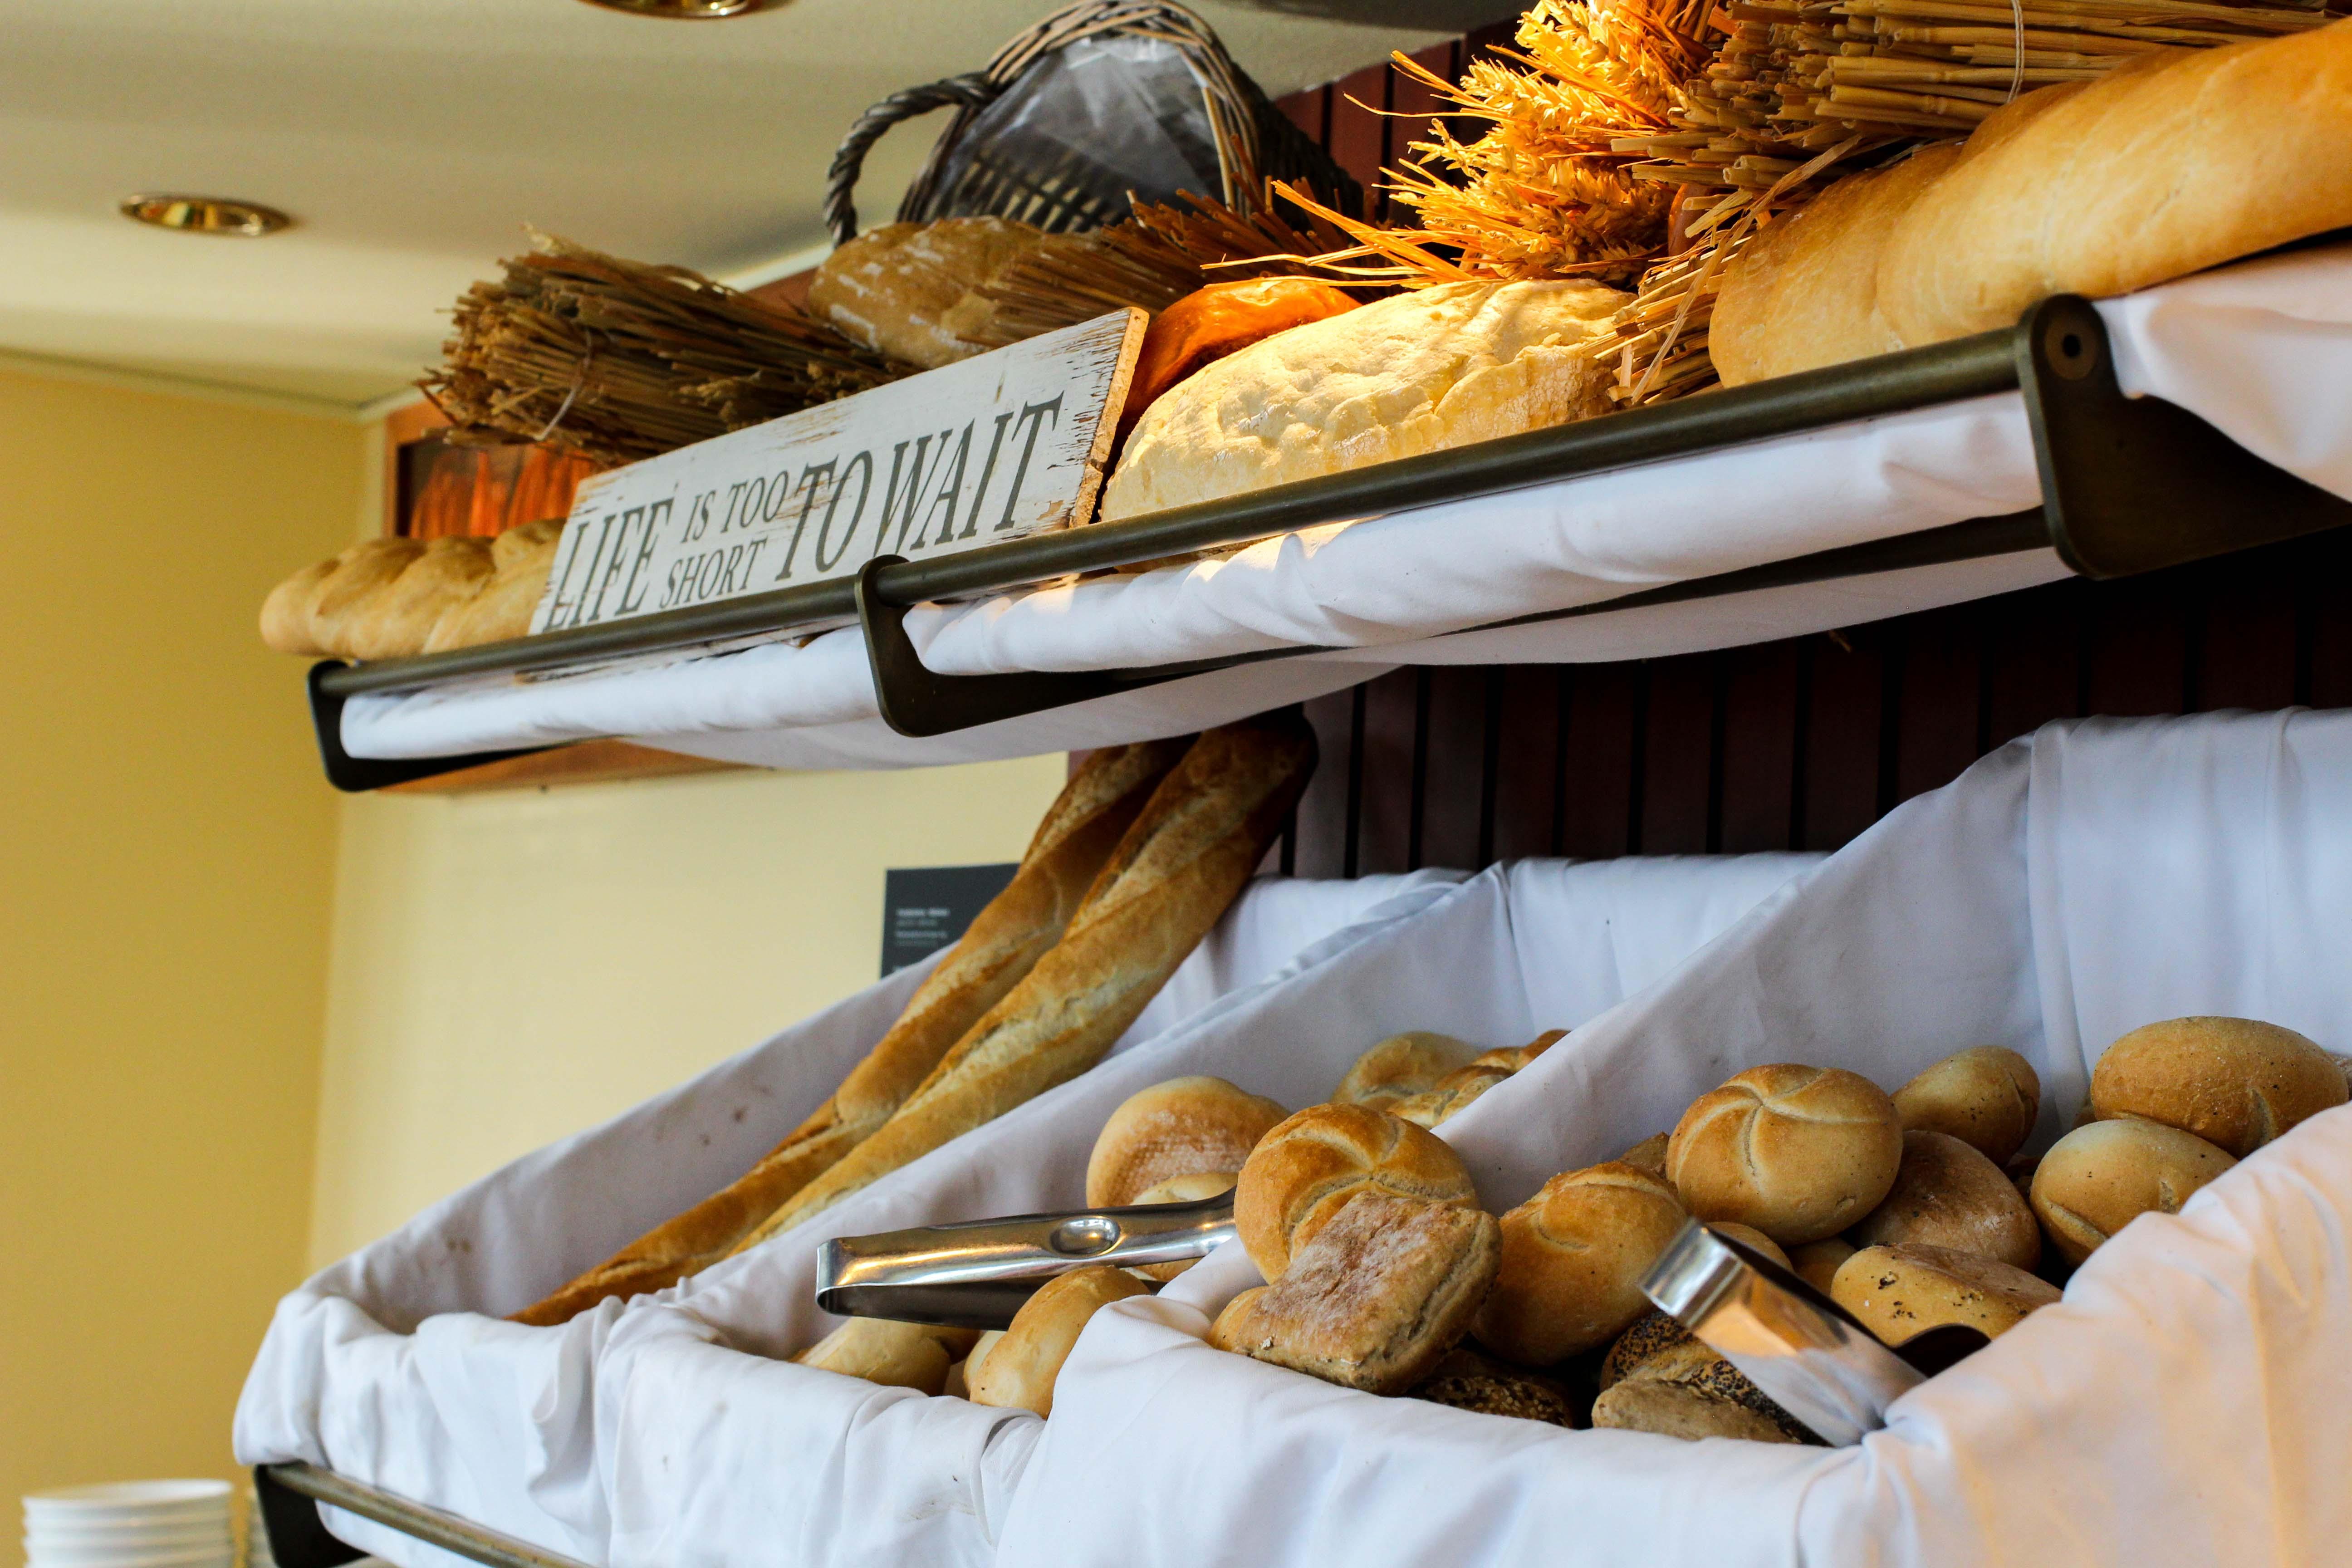 Donaukreuzfahrt A-Rosa Bella Frühstück Brötchen Flusskreuzfahrt Flusskreuzfahrtschiff 7 Tage Donau Klassik Tour Arosa Reiseblogger